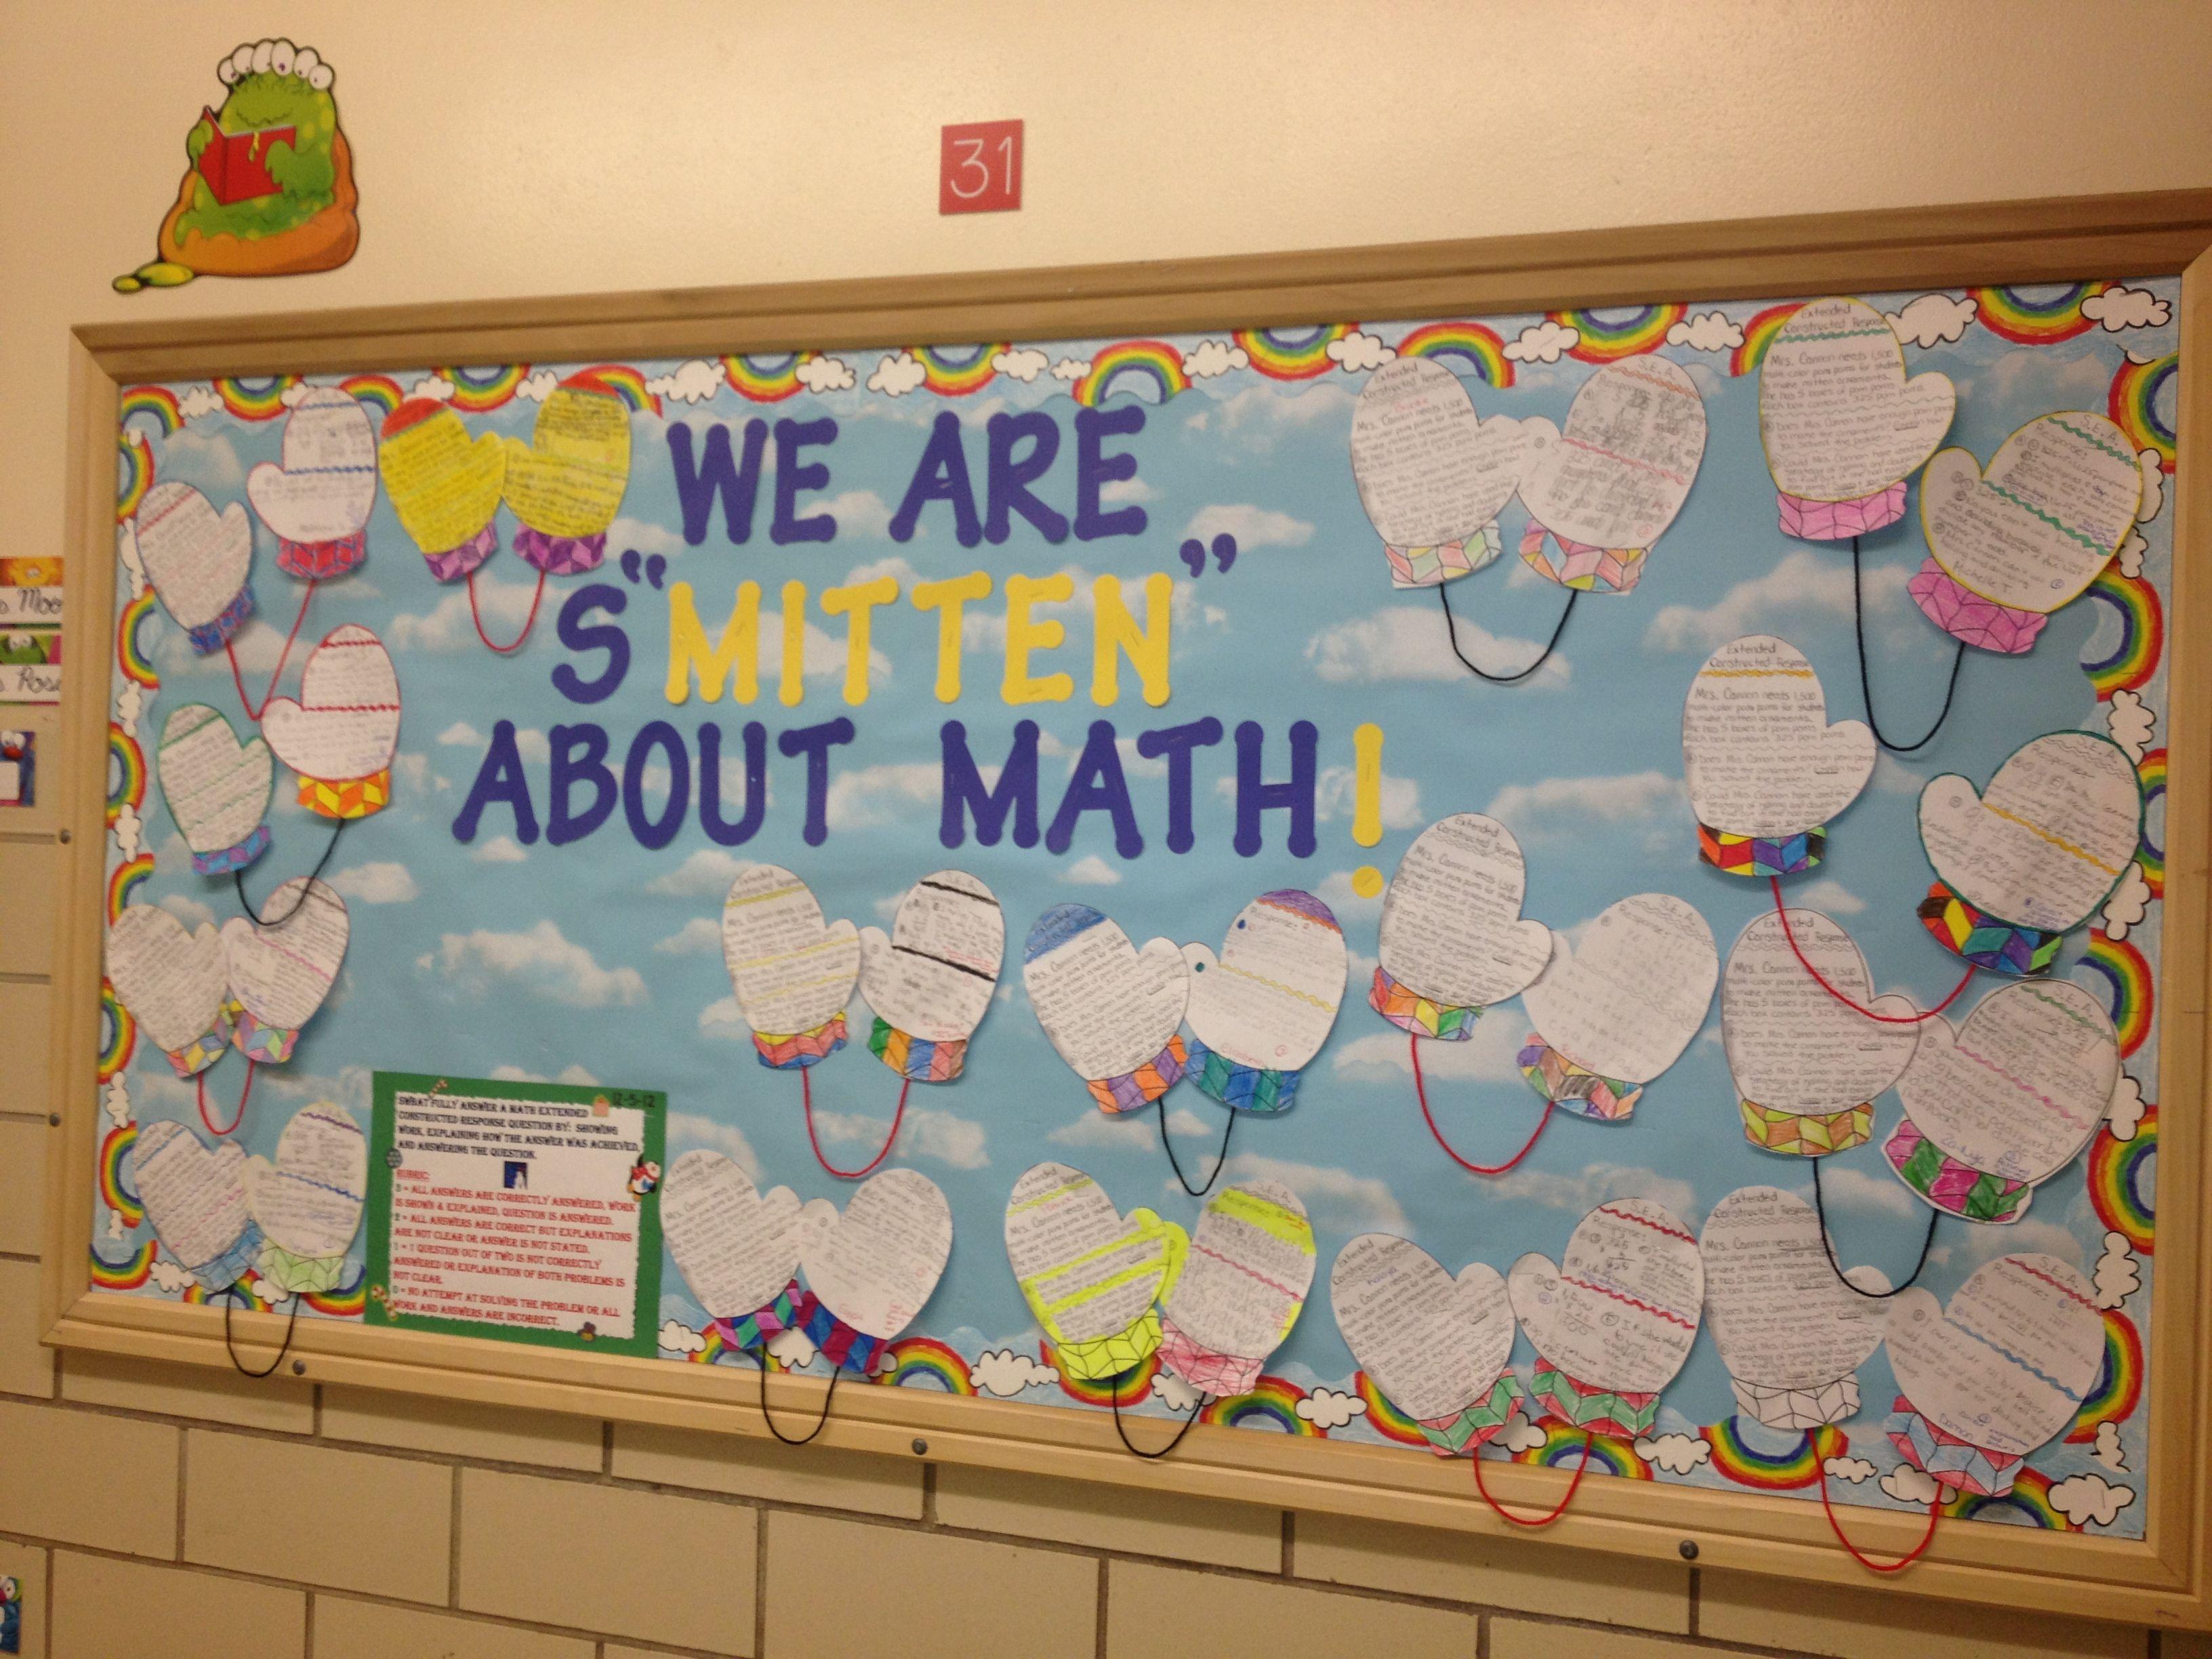 Winter bulletin boards ideas pinterest - Math Bulletin Board We Are S Mitten About Math Here